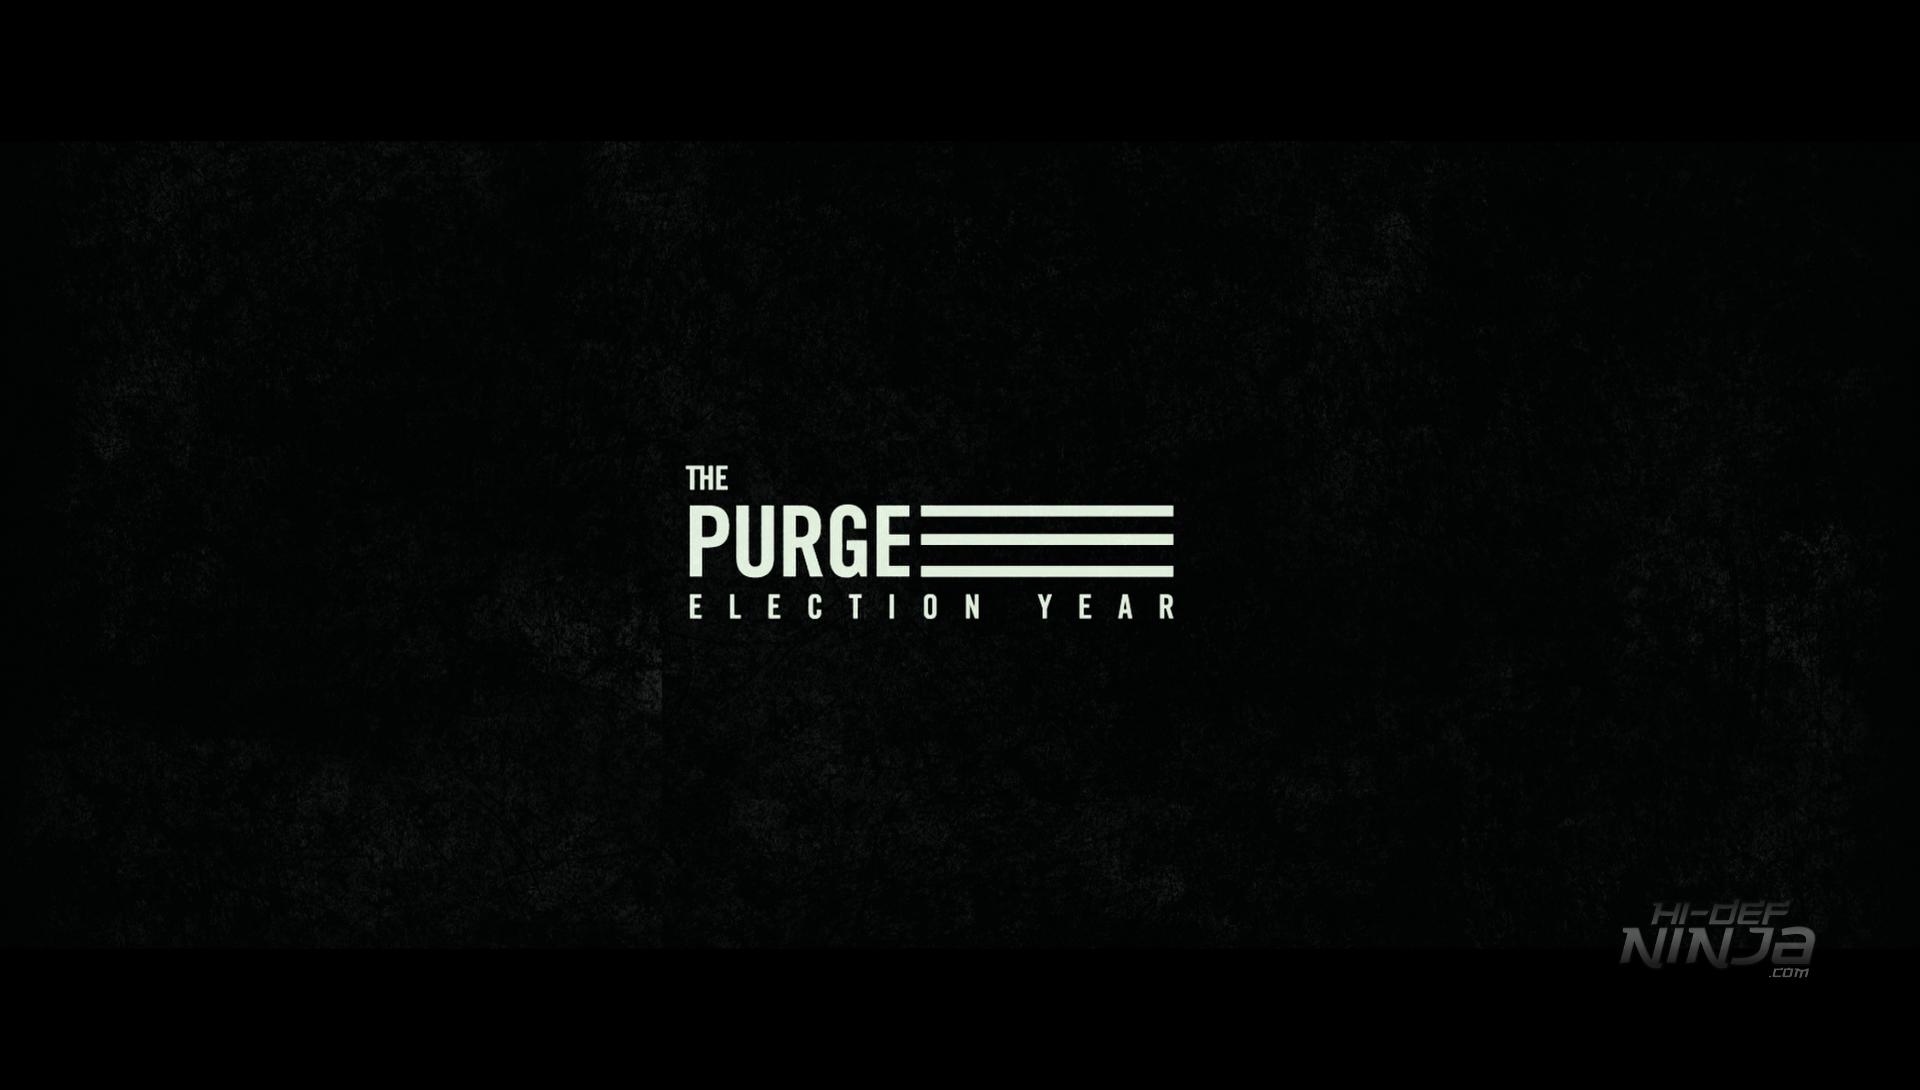 purgeelectionyear-hidefninja-1